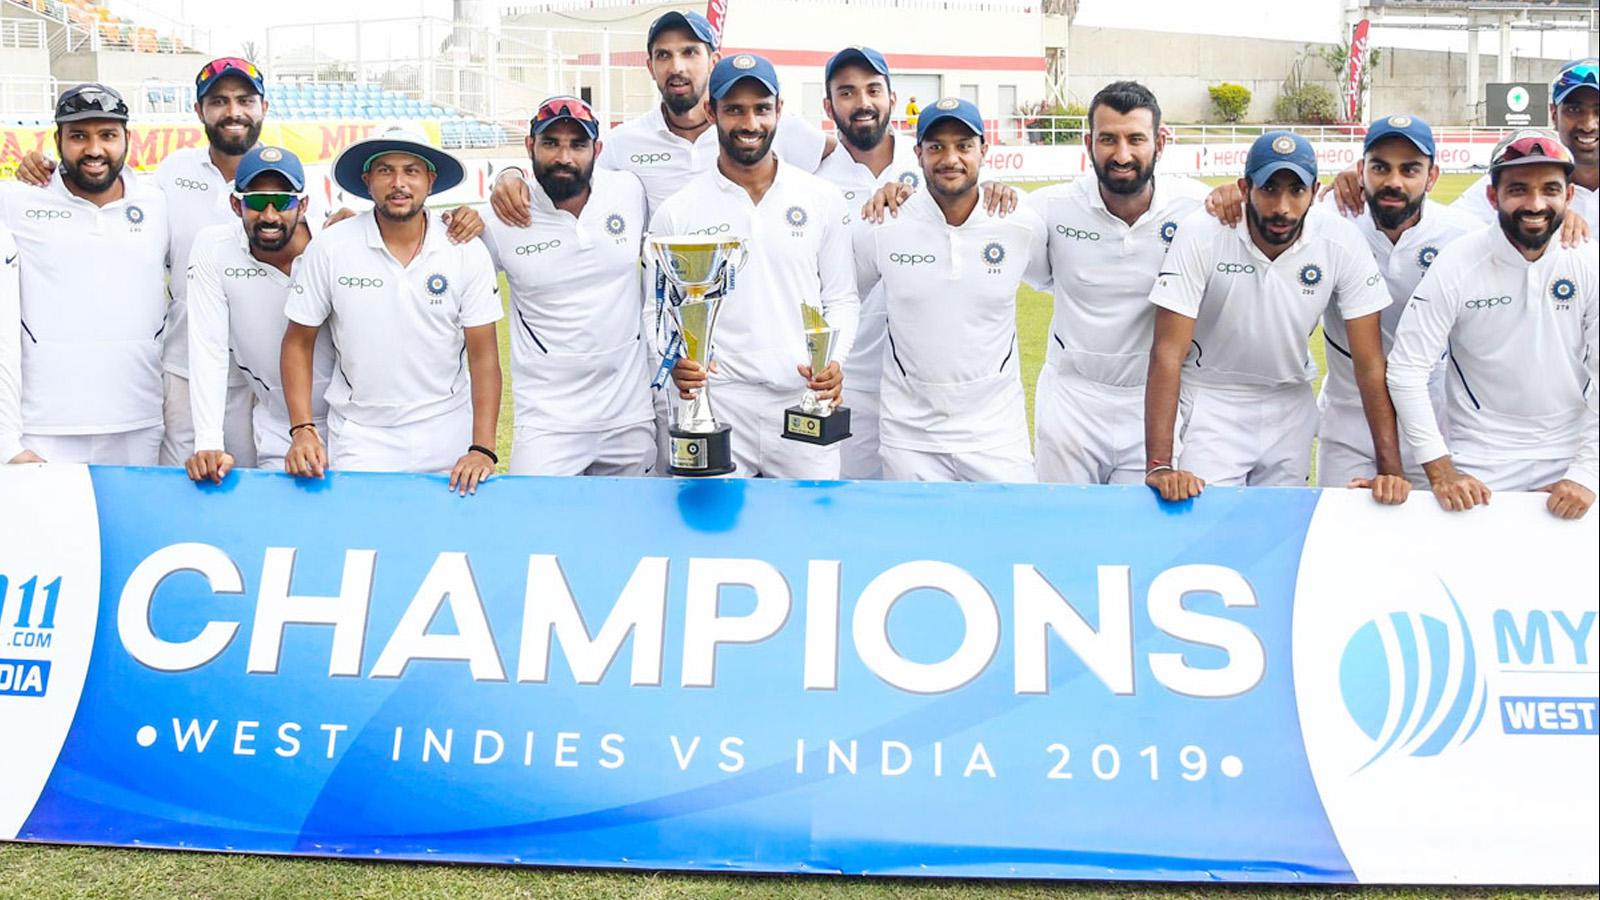 virat-kohli-asked-me-to-hold-the-winners-trophy-and-hugged-me-says-hanuma-vihari